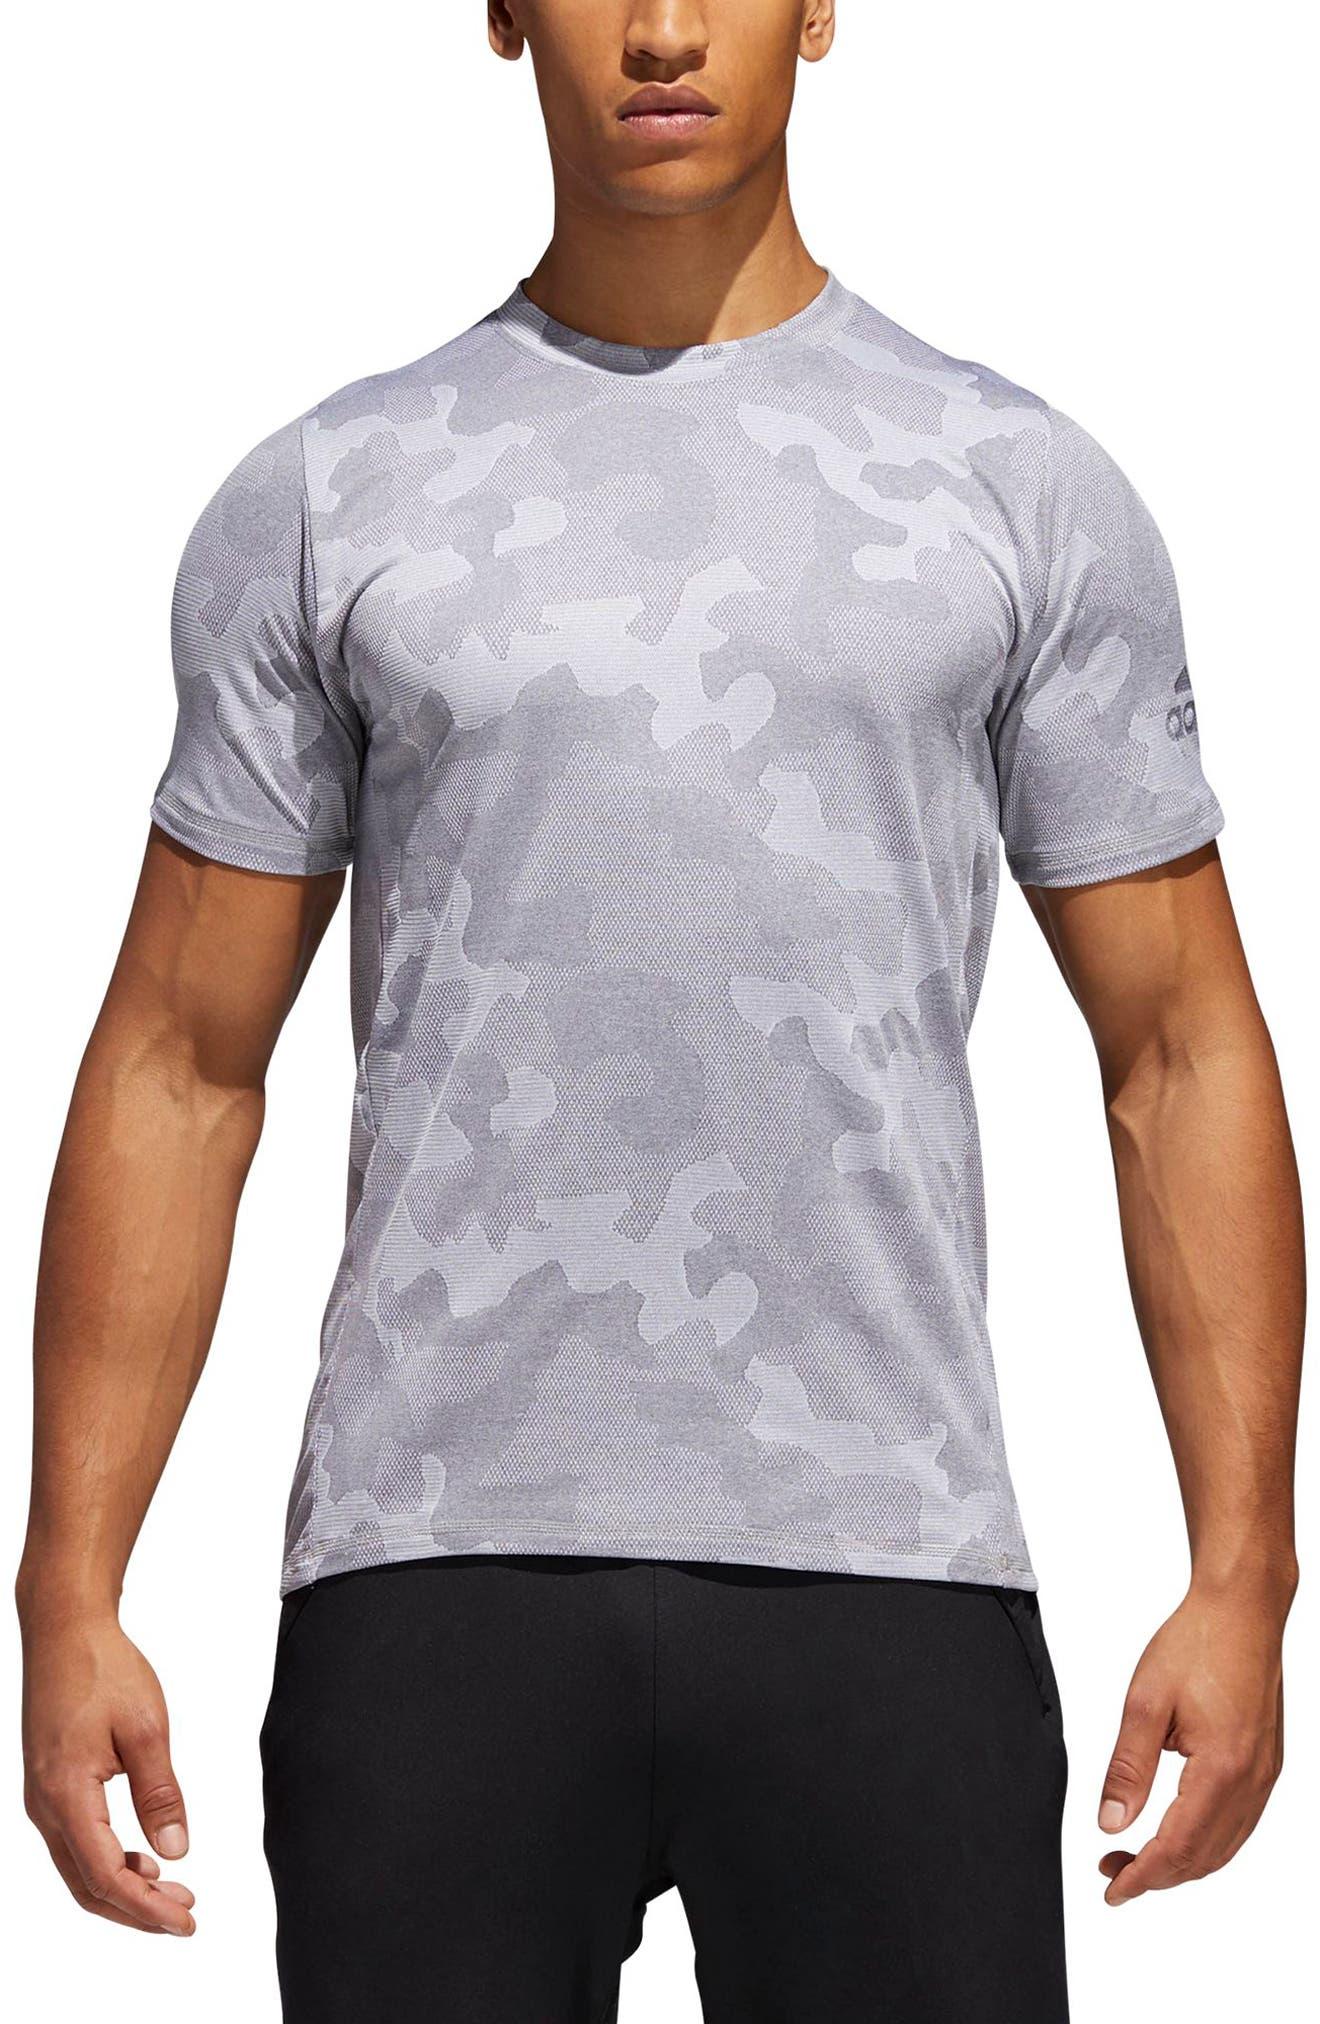 Camo Hype T-Shirt,                         Main,                         color, Grey Three / White